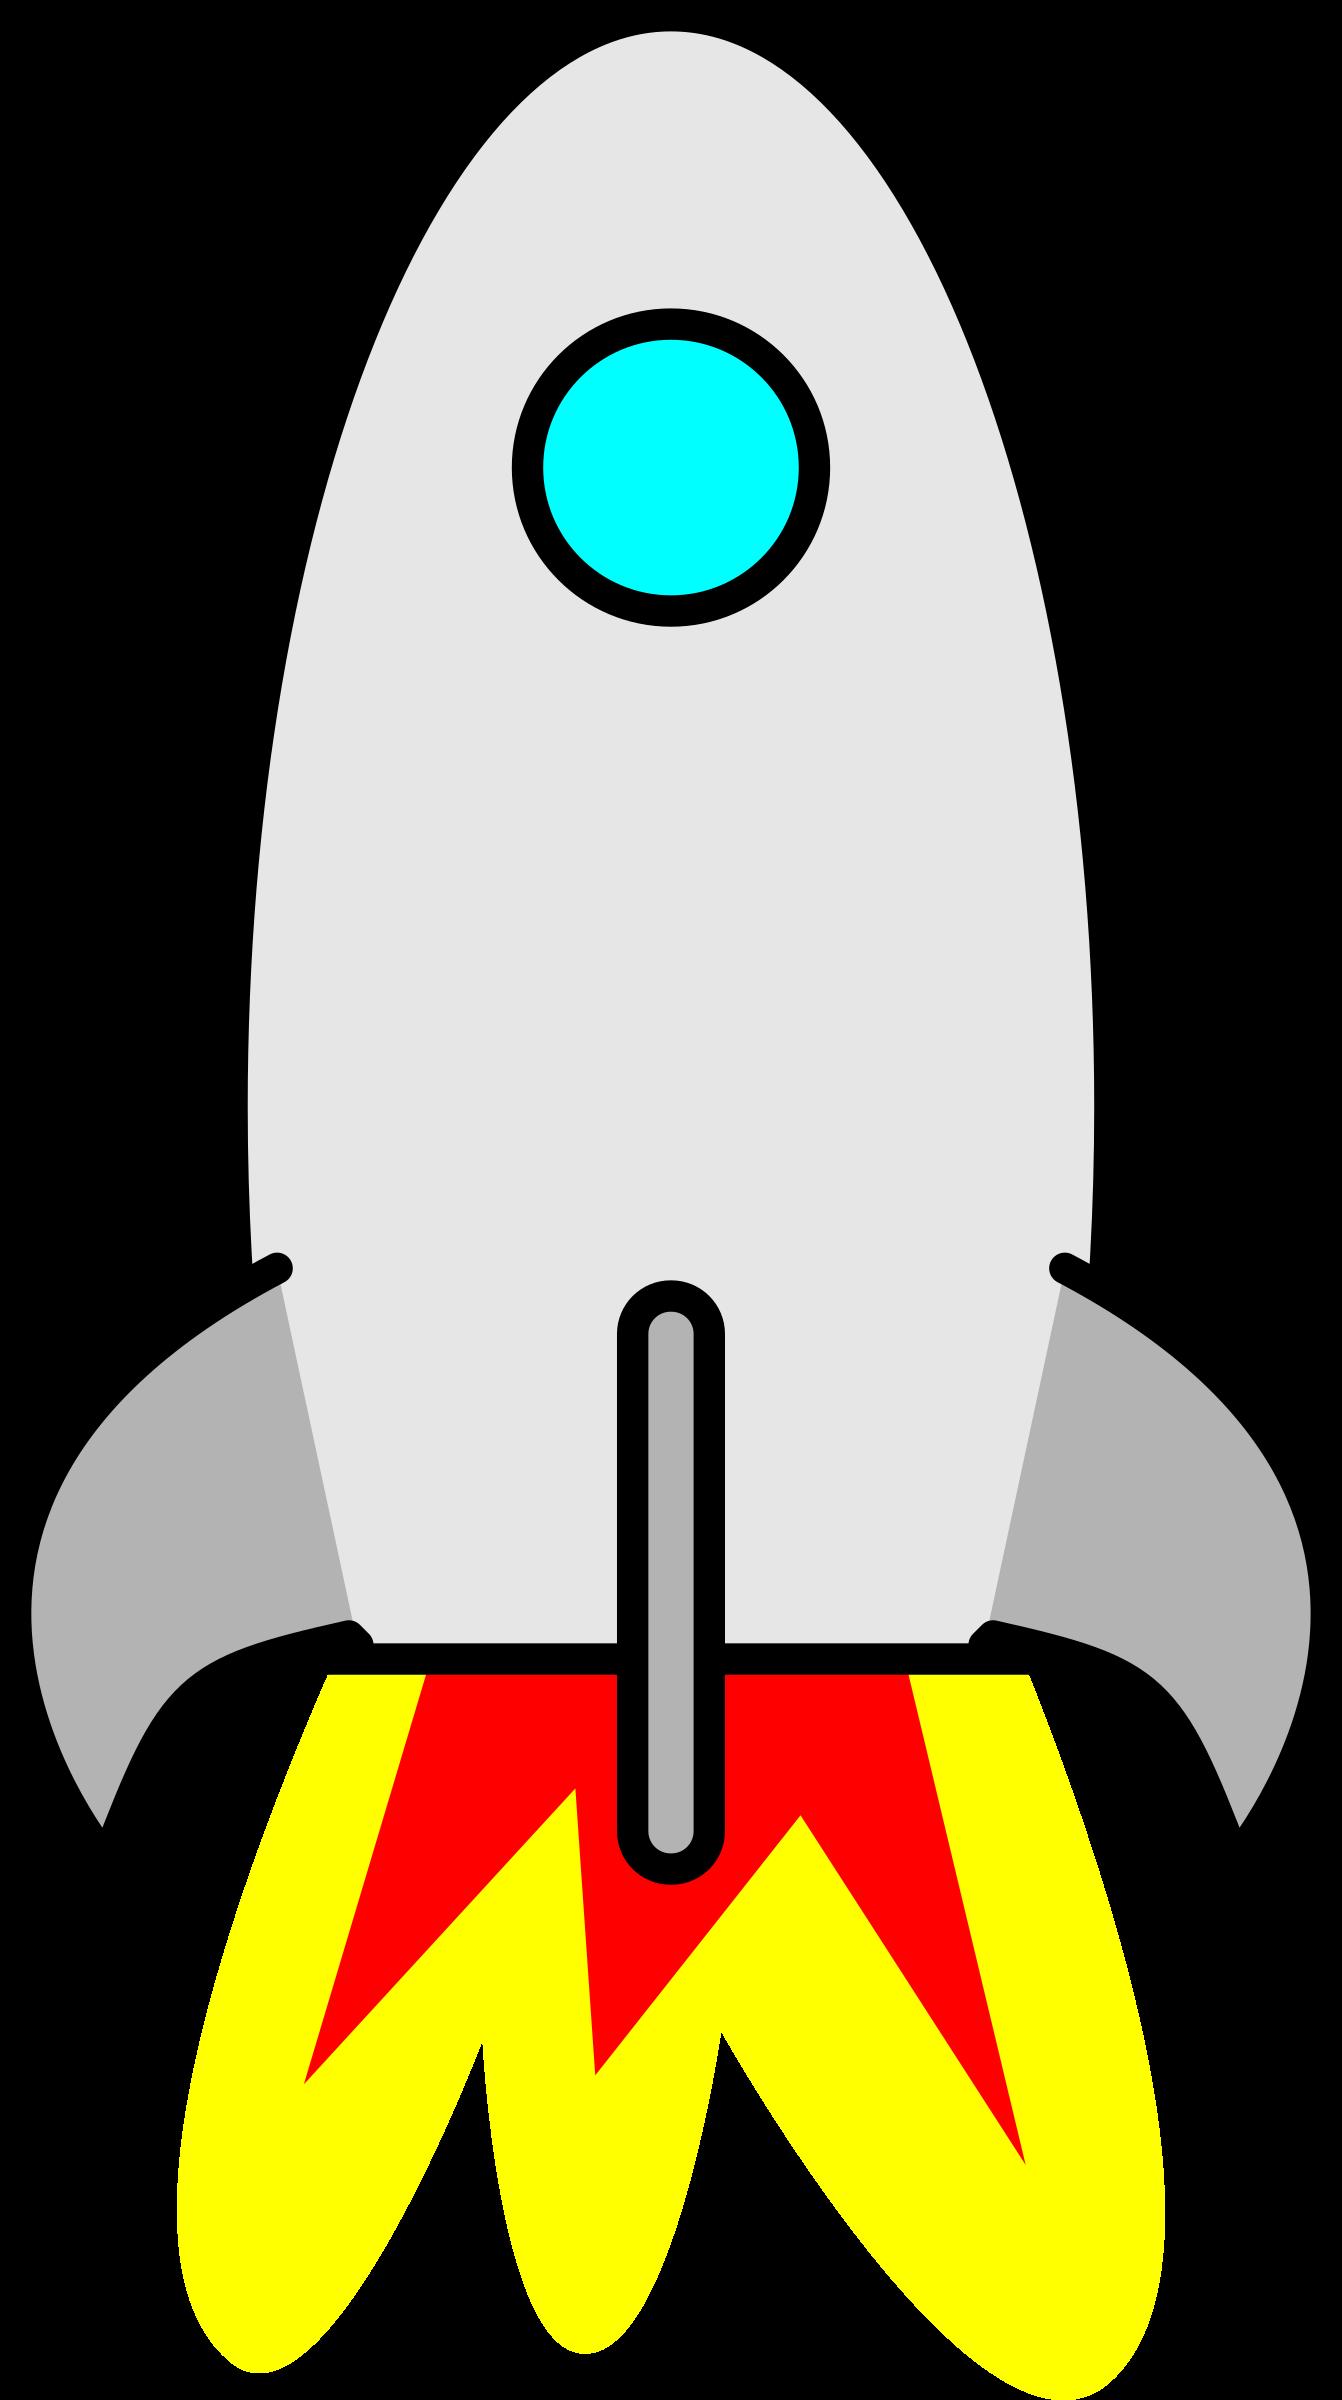 Future clipart spaceship. Rocket big image png